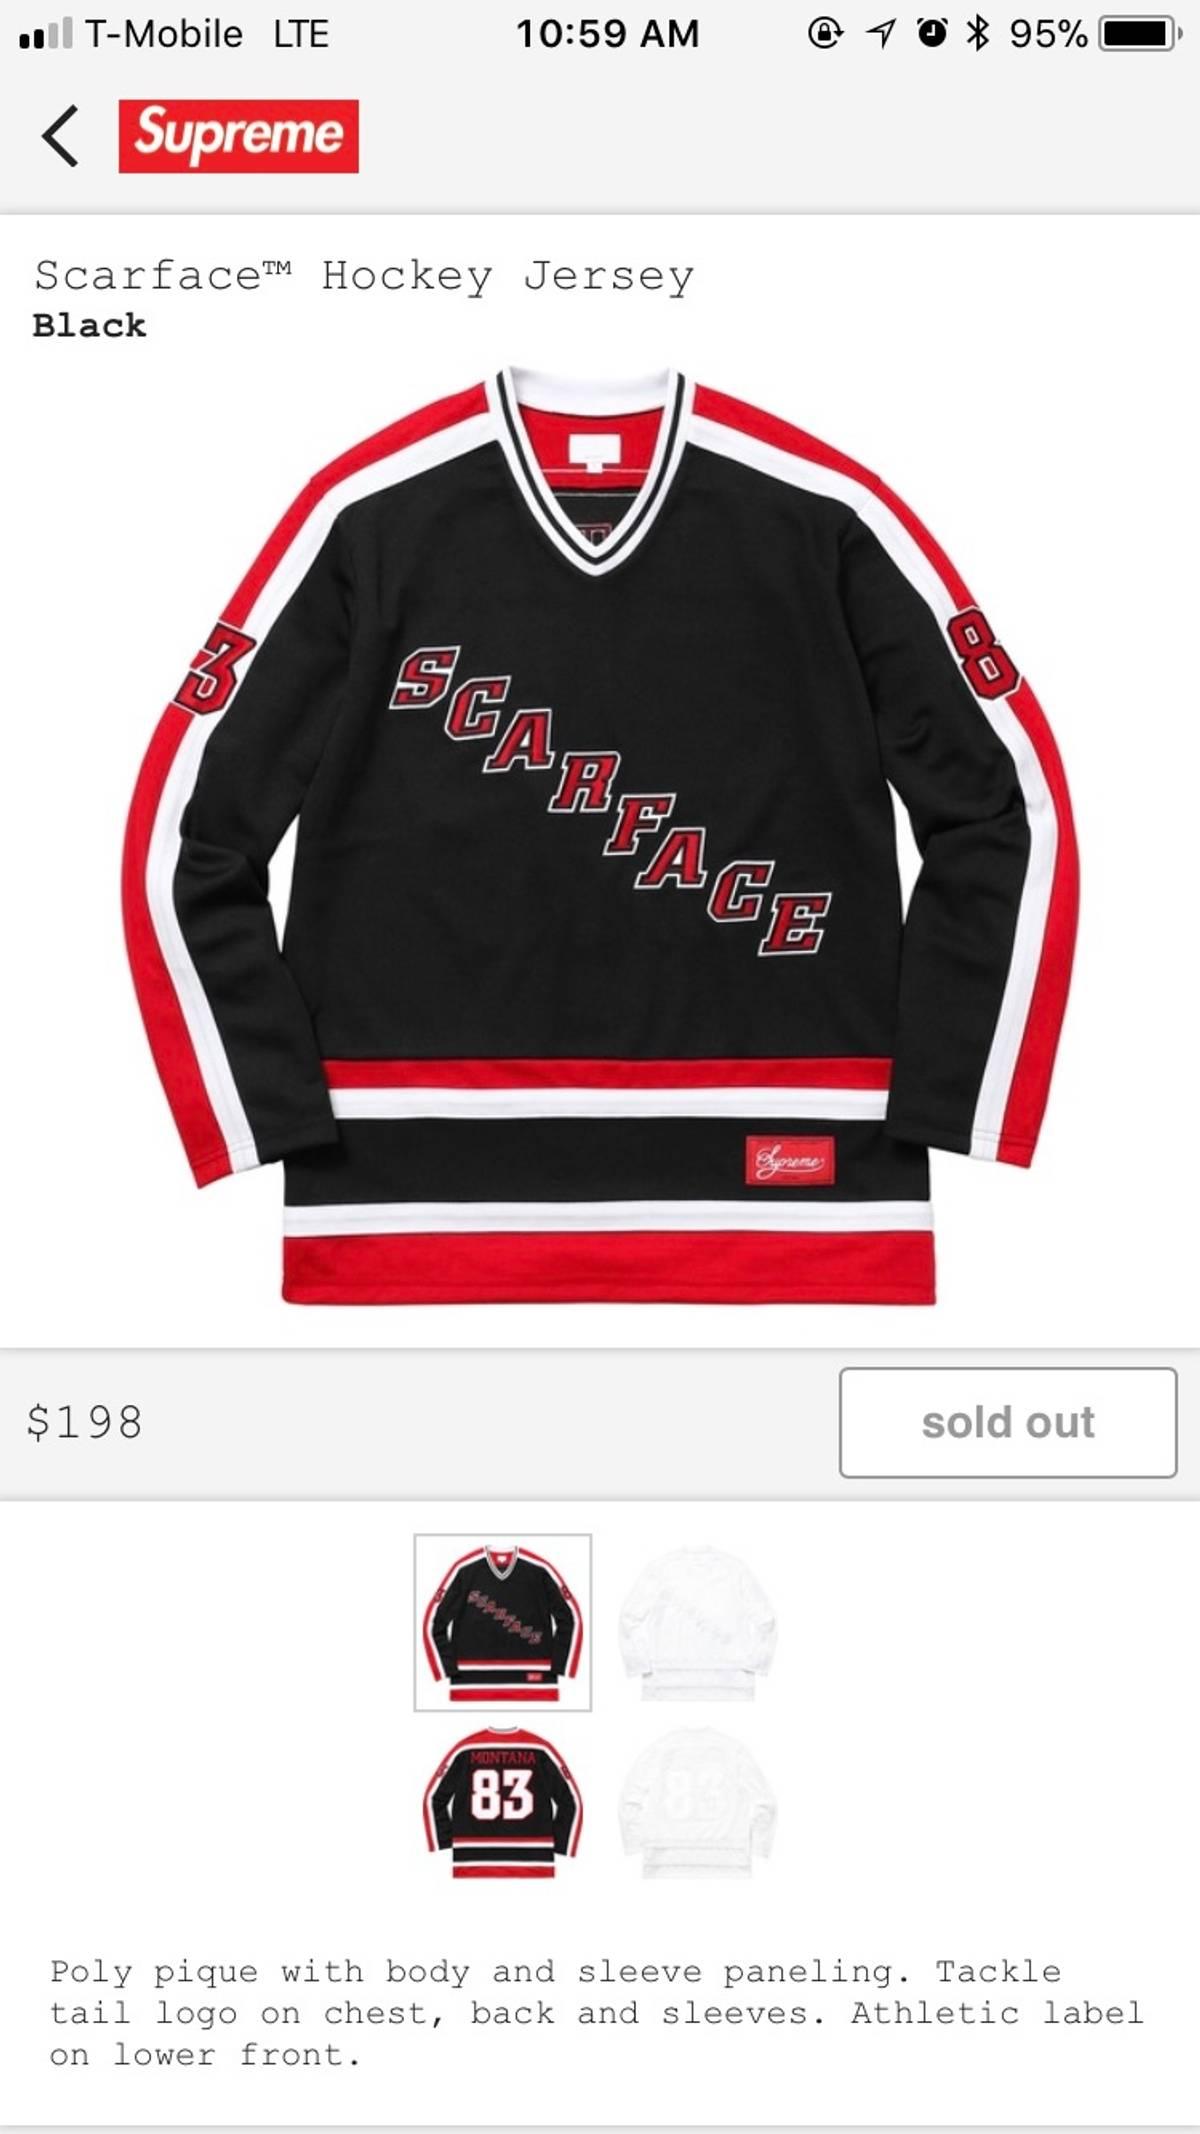 4a8c3a1f72eb Supreme Supreme Scarface Hockey Jersey Black Medium   Grailed